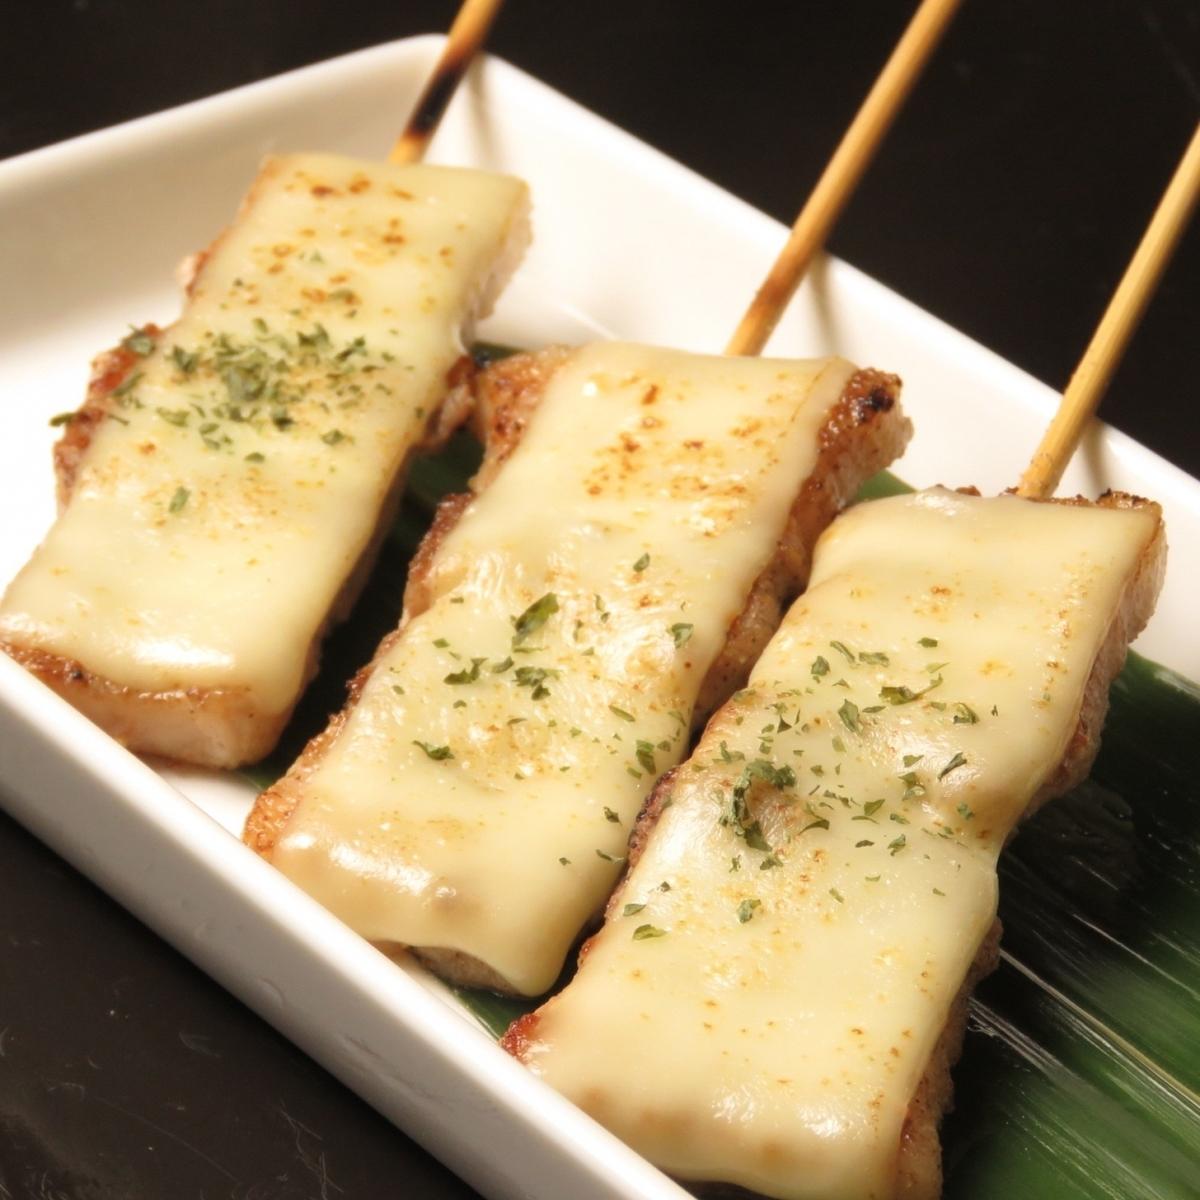 Pork belly (cheese onions) / Tori (Salt · Sauce) / Tori skin (salt · sauce)